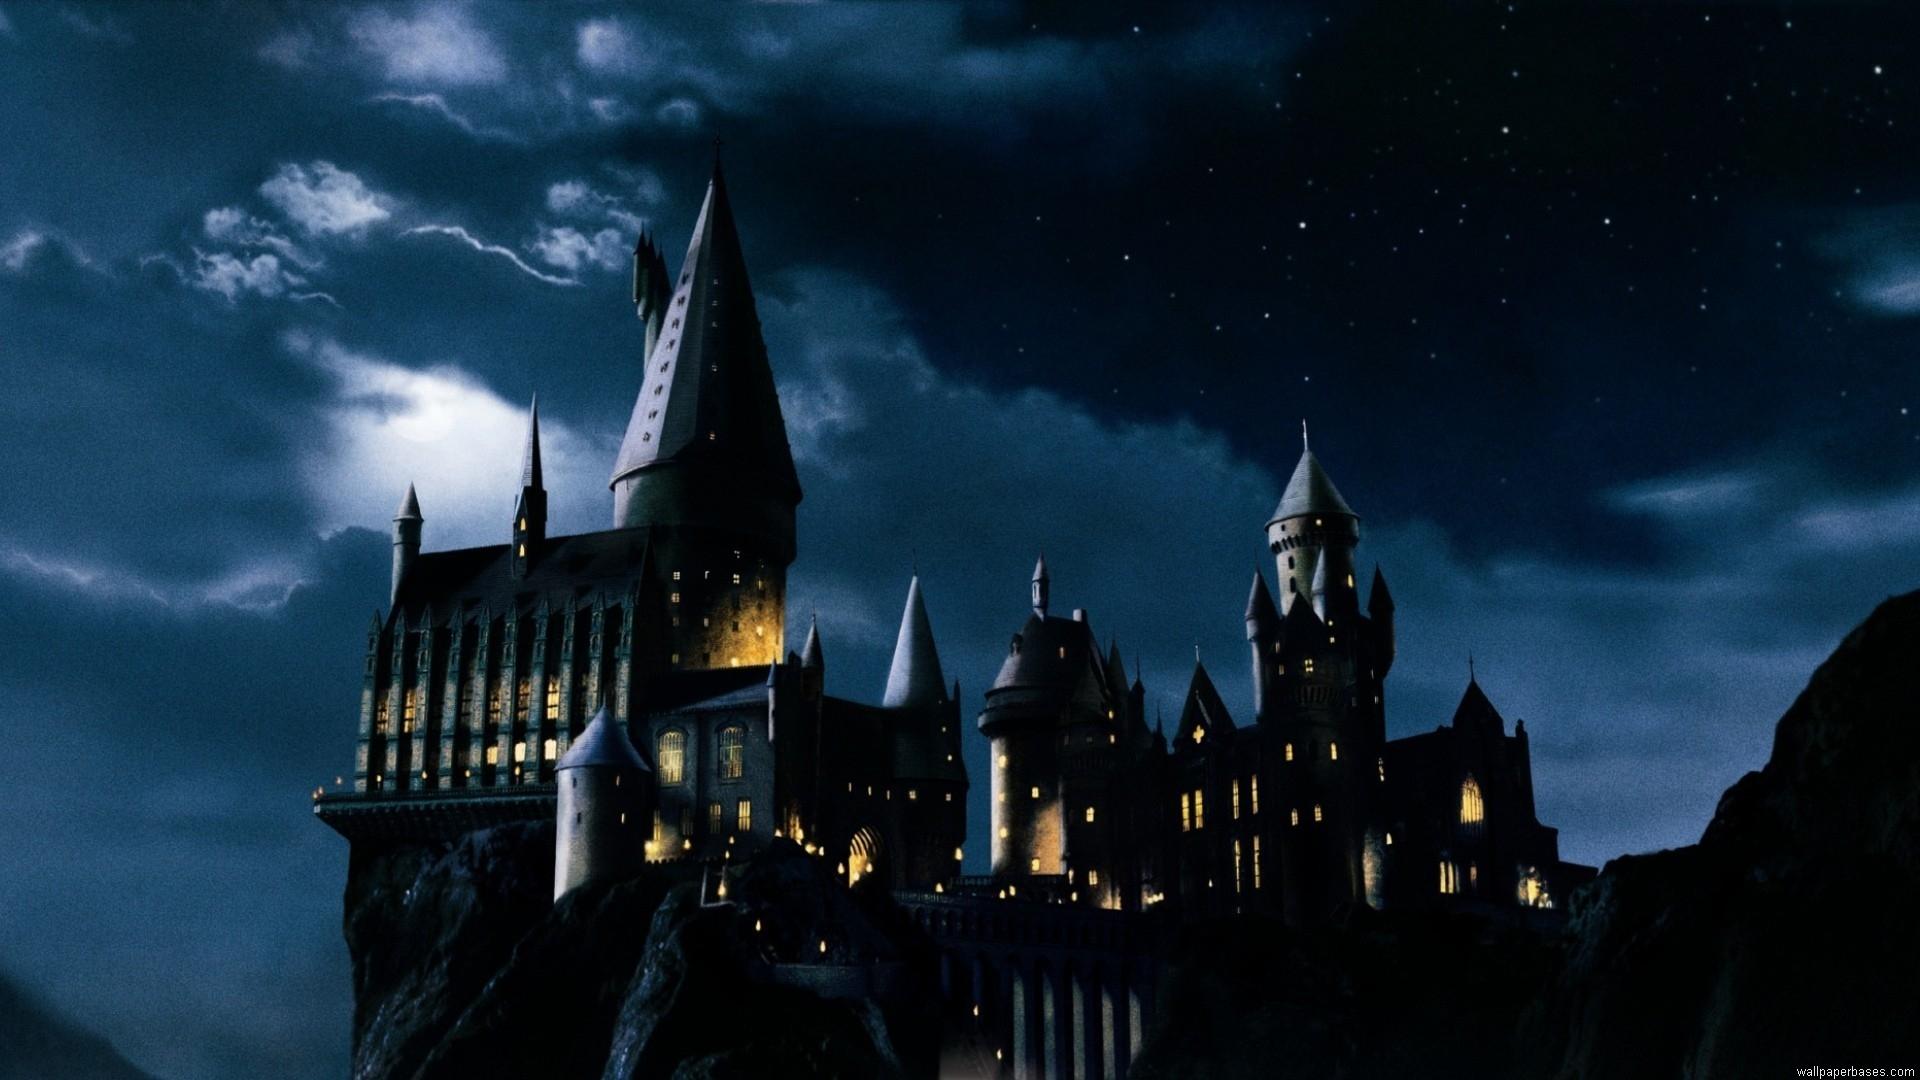 Harry Potter Wallpapers Hd: [44+] 1080P Harry Potter Wallpaper On WallpaperSafari